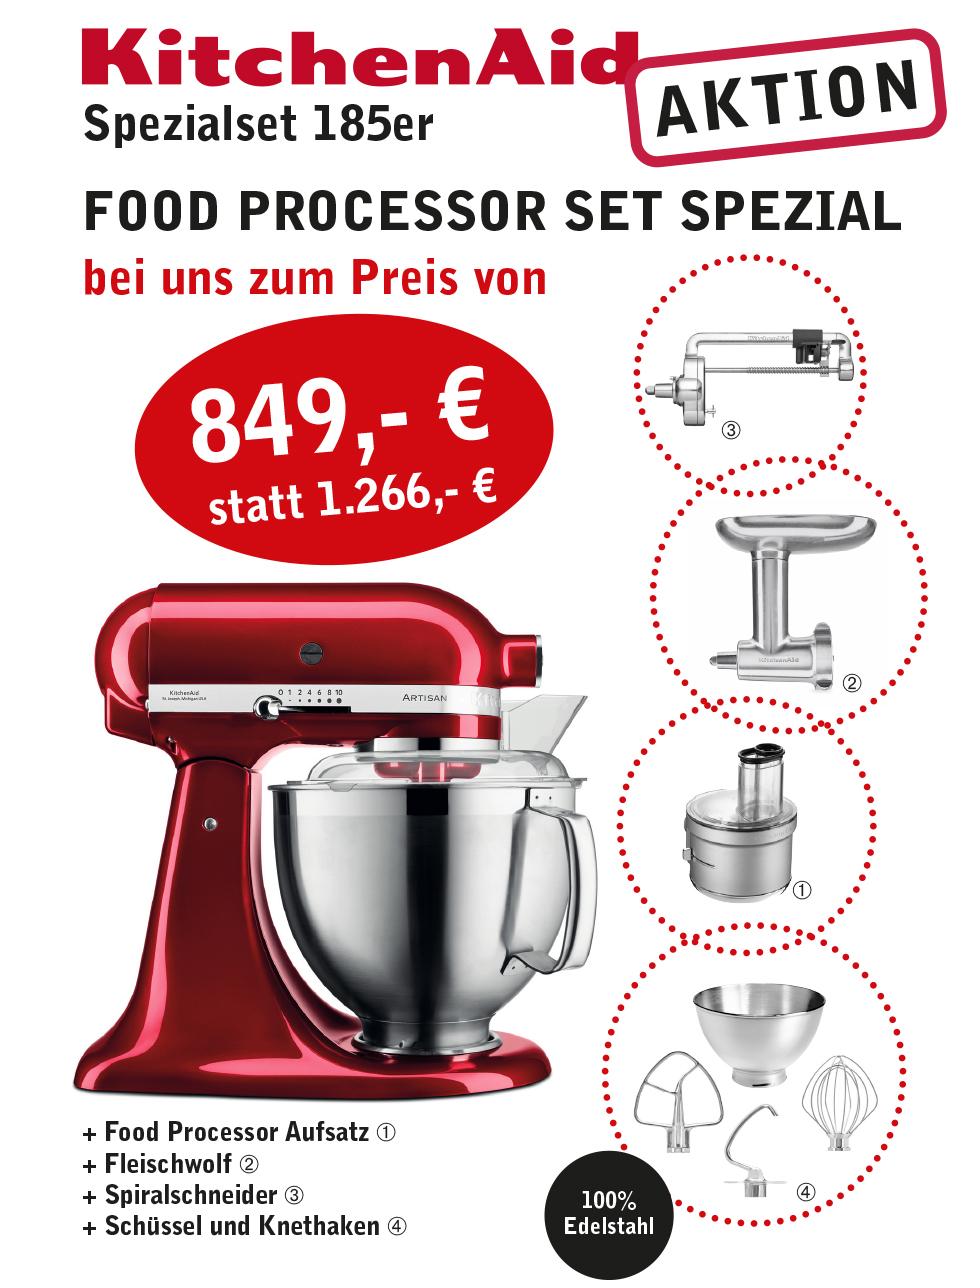 food Processor Set Spezial